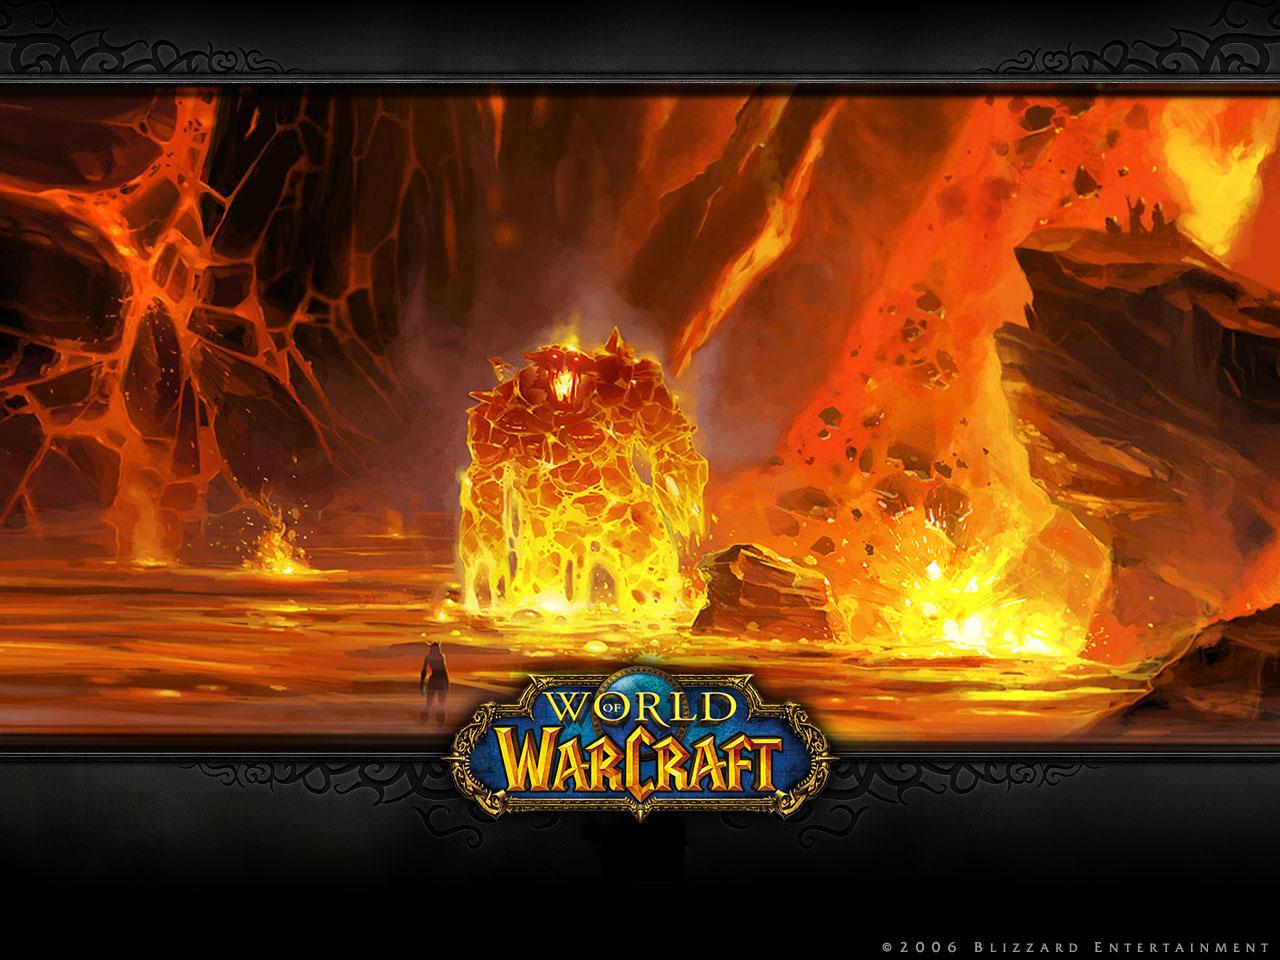 http://4.bp.blogspot.com/-fQlA3LE7NCo/TYv3y42TILI/AAAAAAAABE8/kpjtgGXeIMw/s1600/dota_allstars_wallpaper_warcraft_wallpaper_6.jpg